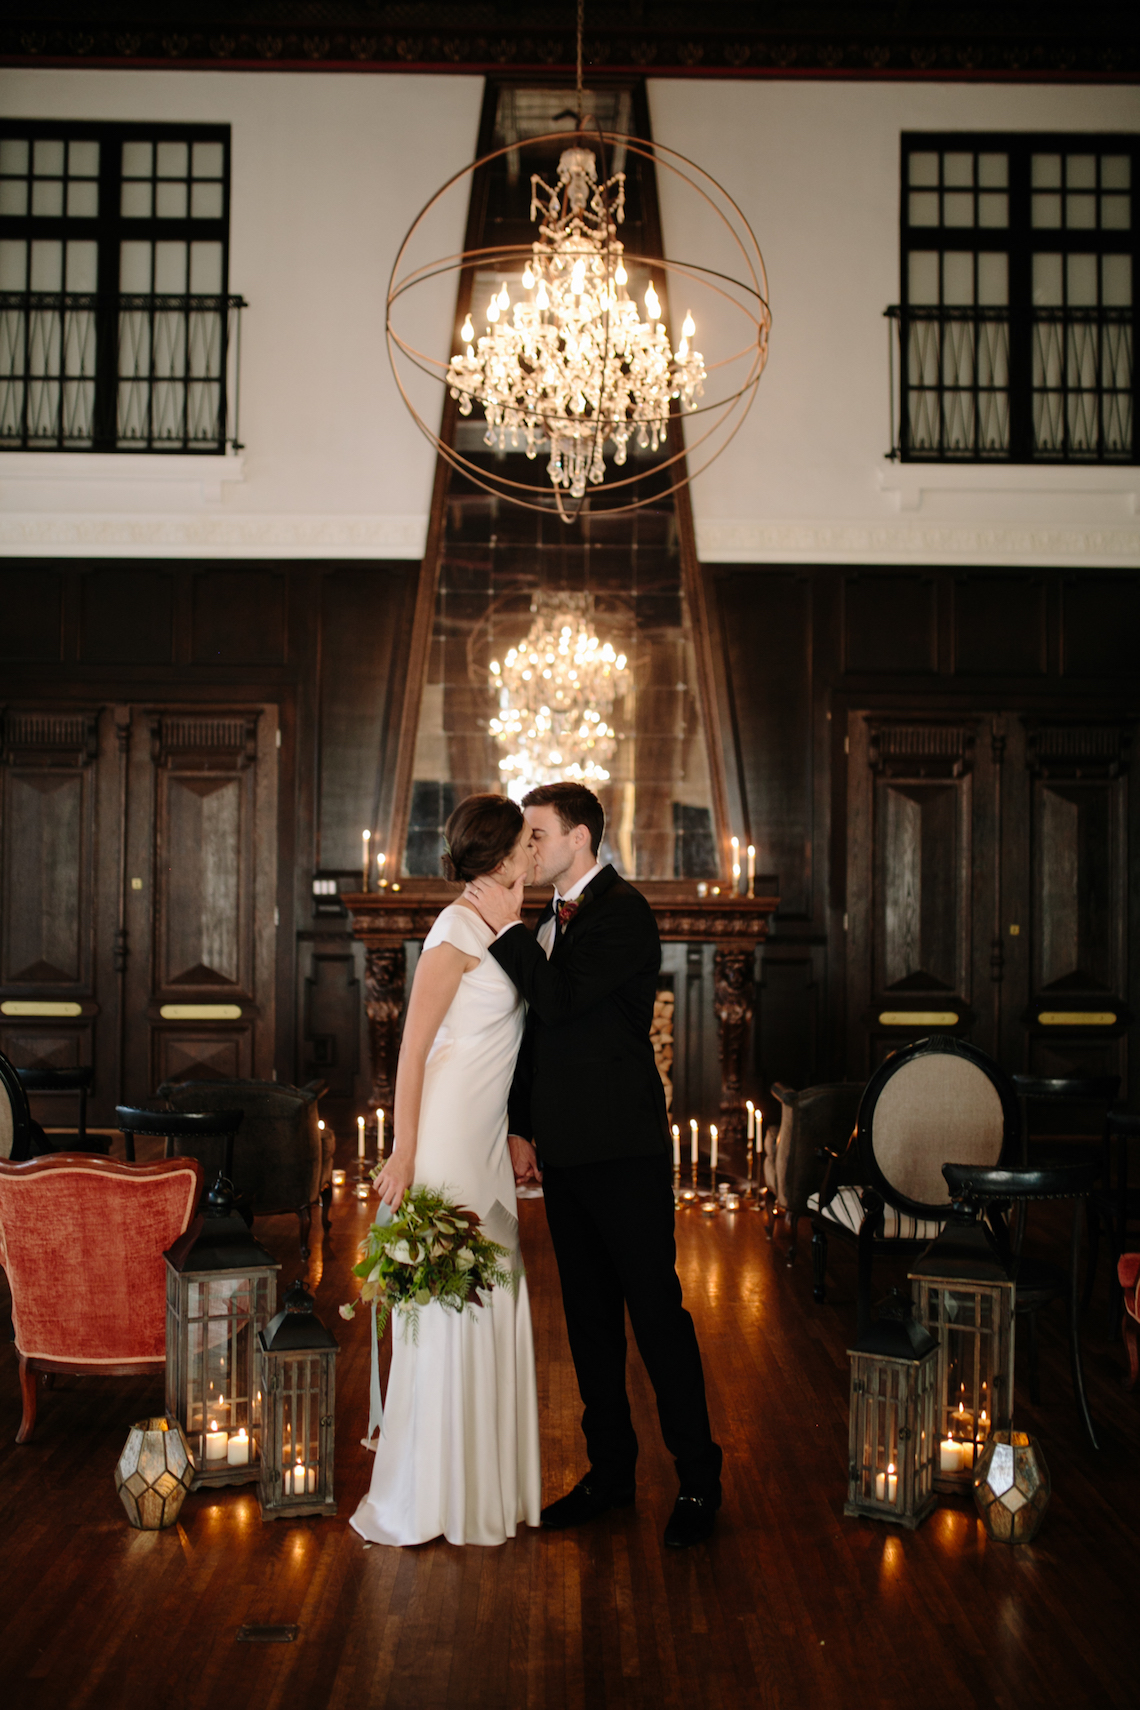 Romantic, Spanish, Hemingway Inspired Wedding Style | All in Love Design by Anna Lisa | Scott Sikora 60